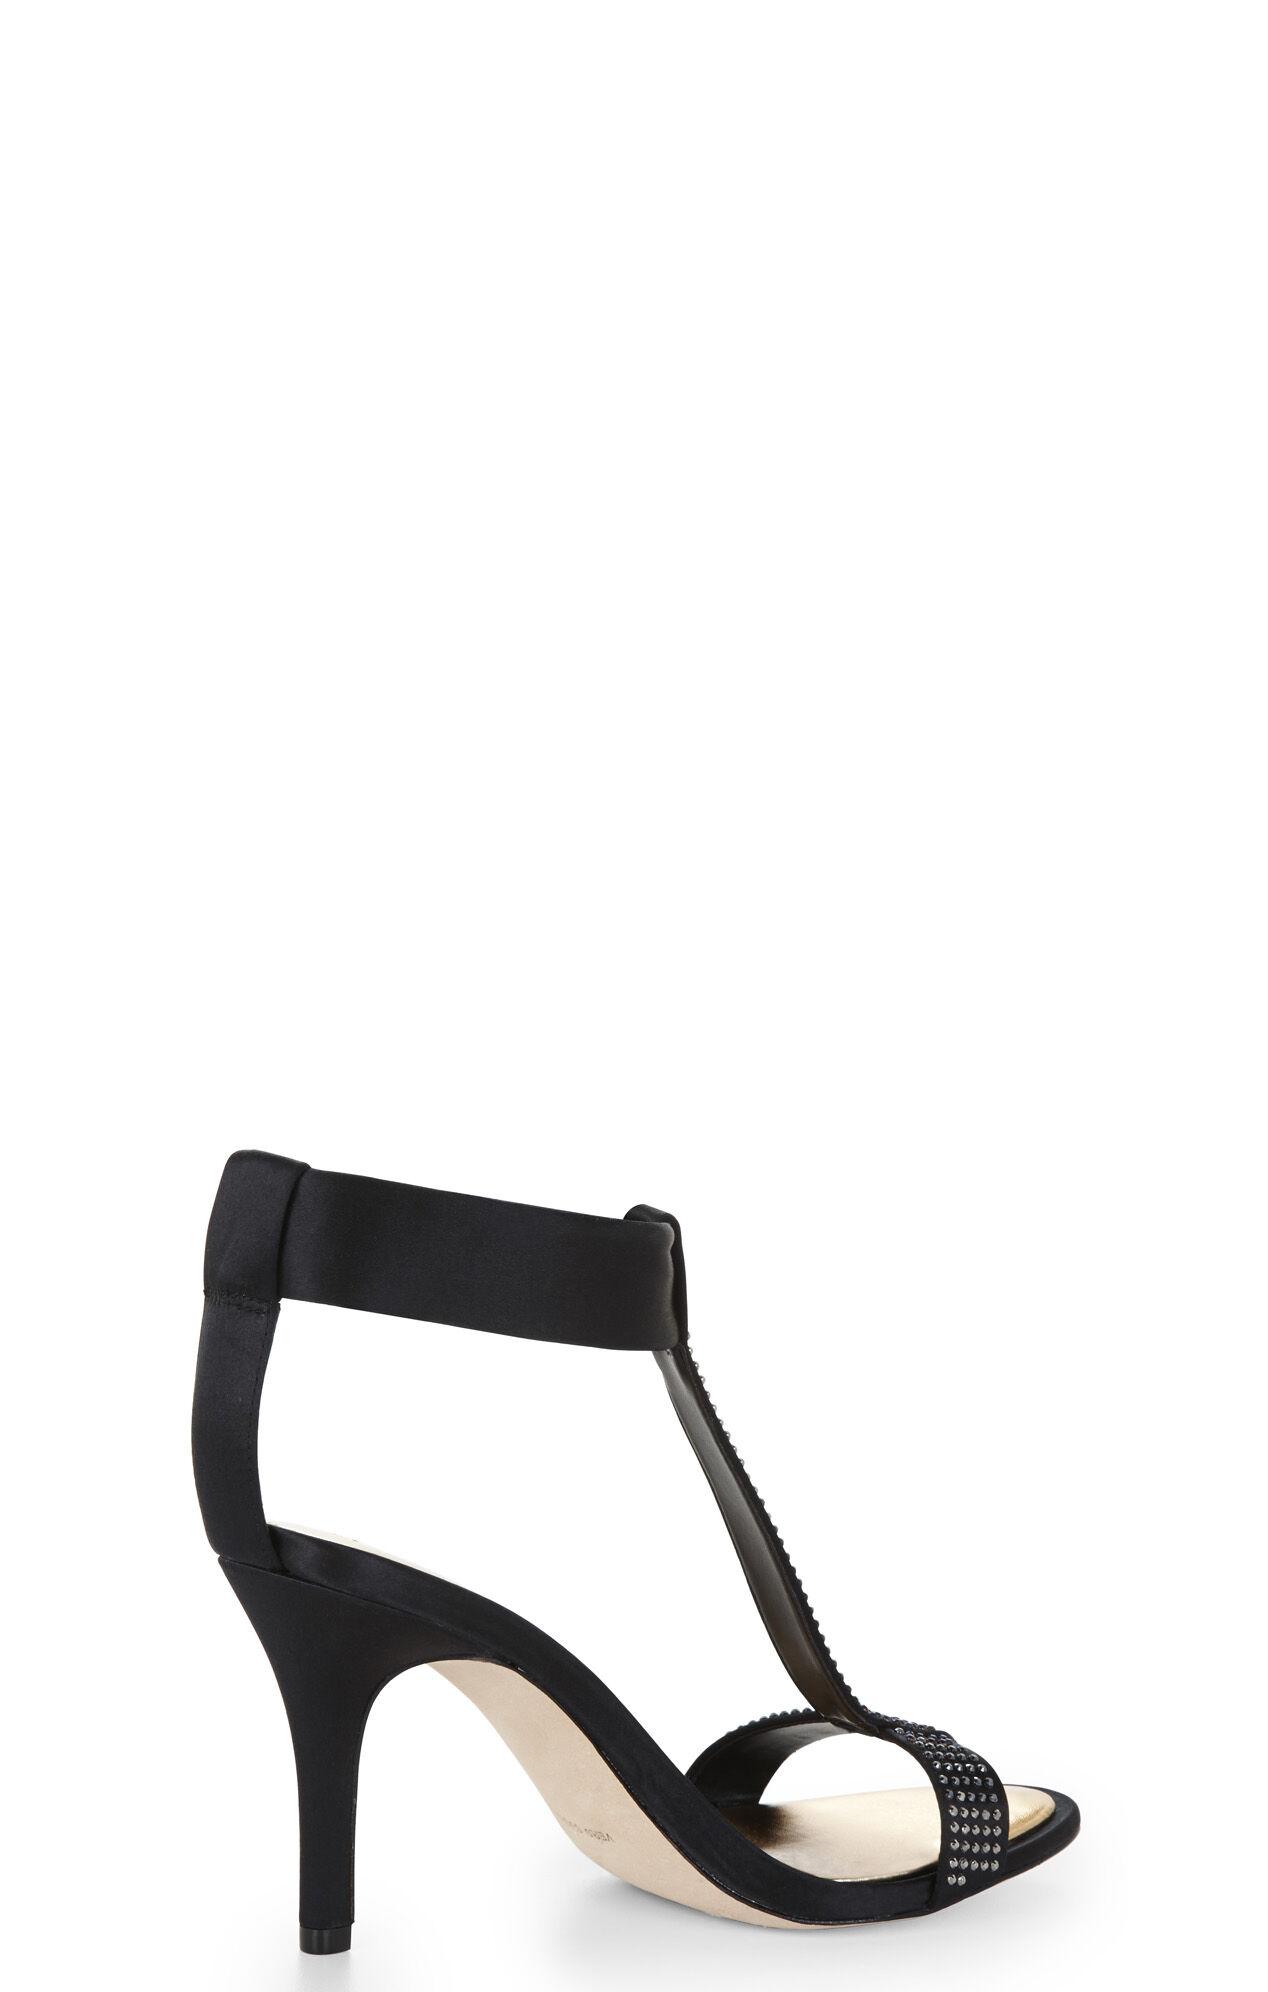 Pinitt High-Heel Sandal